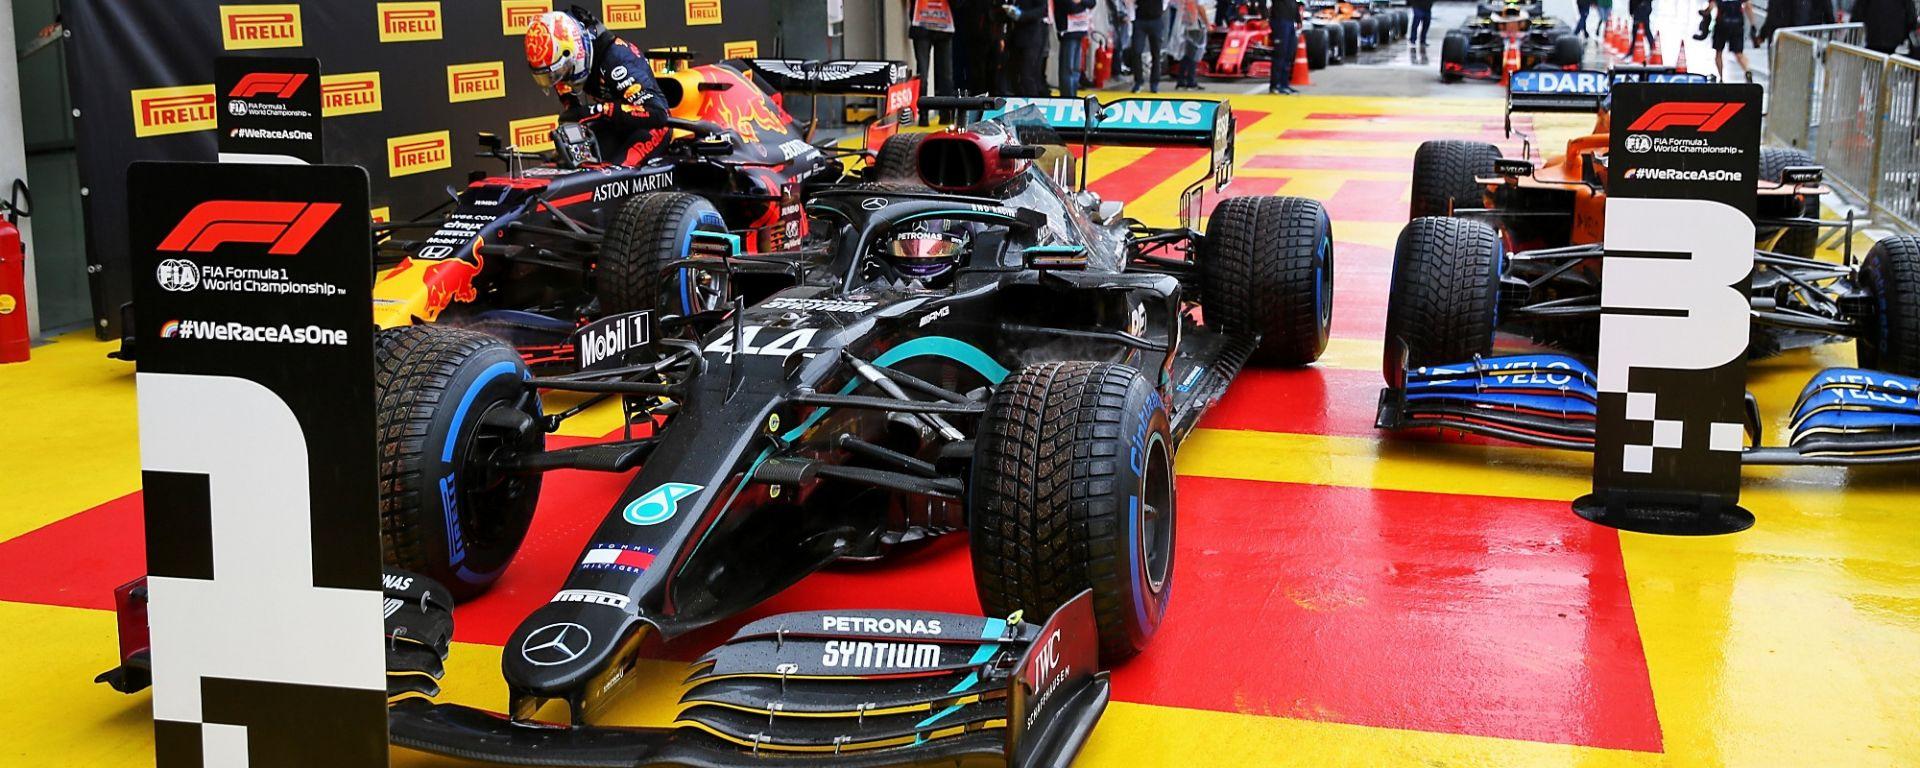 GP Stiria 2020, Spielberg: i primi tre in qualifica: Hamilton (Mercedes), Verstappen (Red Bull) e Sainz (McLaren)